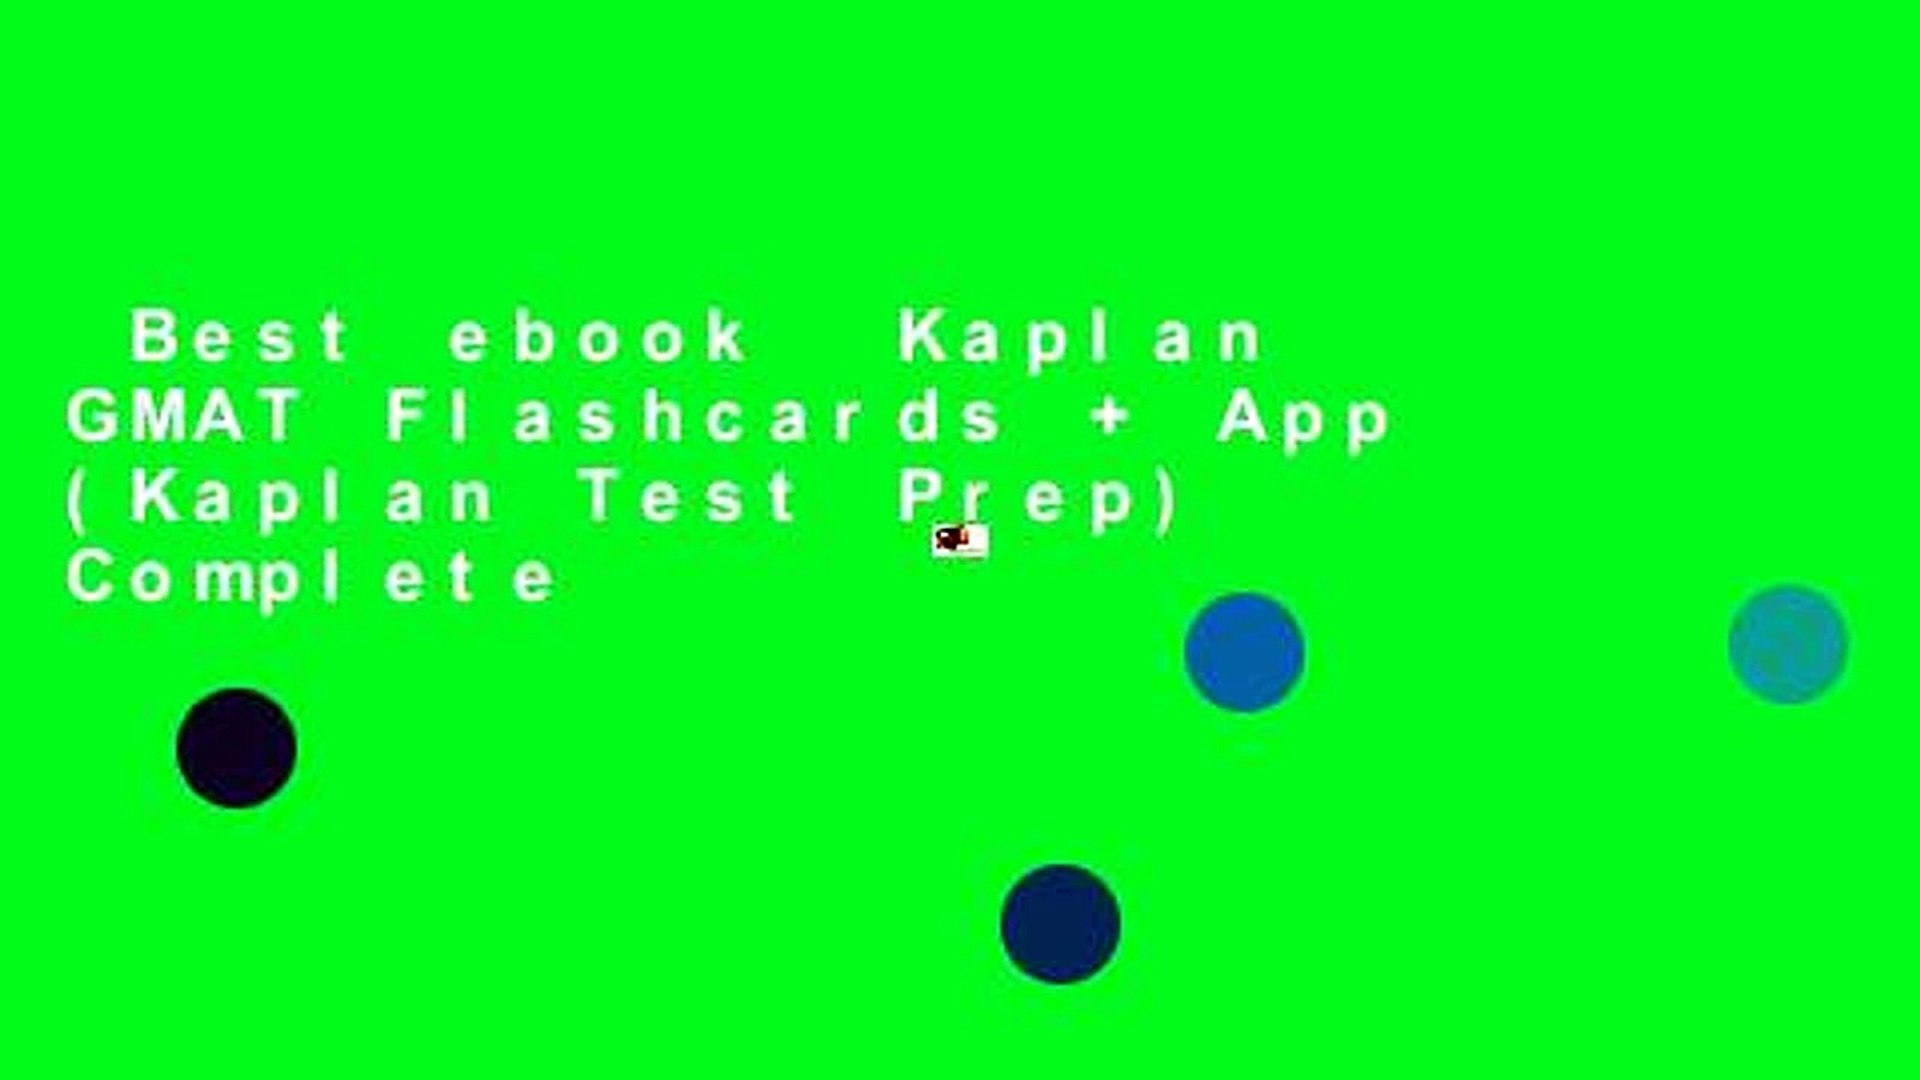 Best ebook Kaplan GMAT Flashcards + App (Kaplan Test Prep) Complete